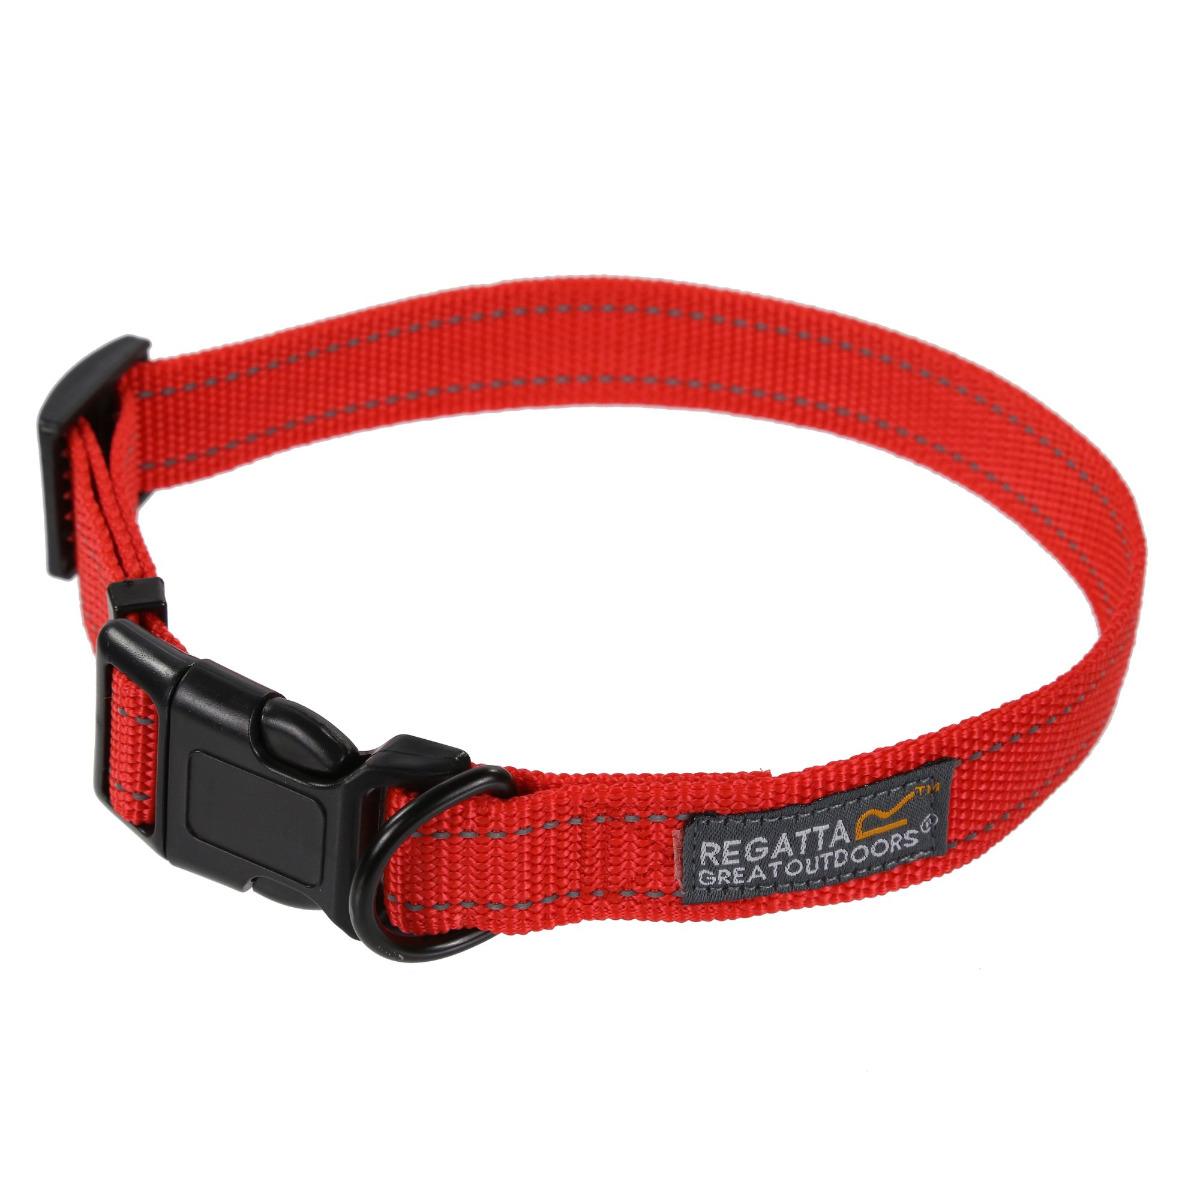 Regatta Comfort Dog Collar - Red - 30 - 55